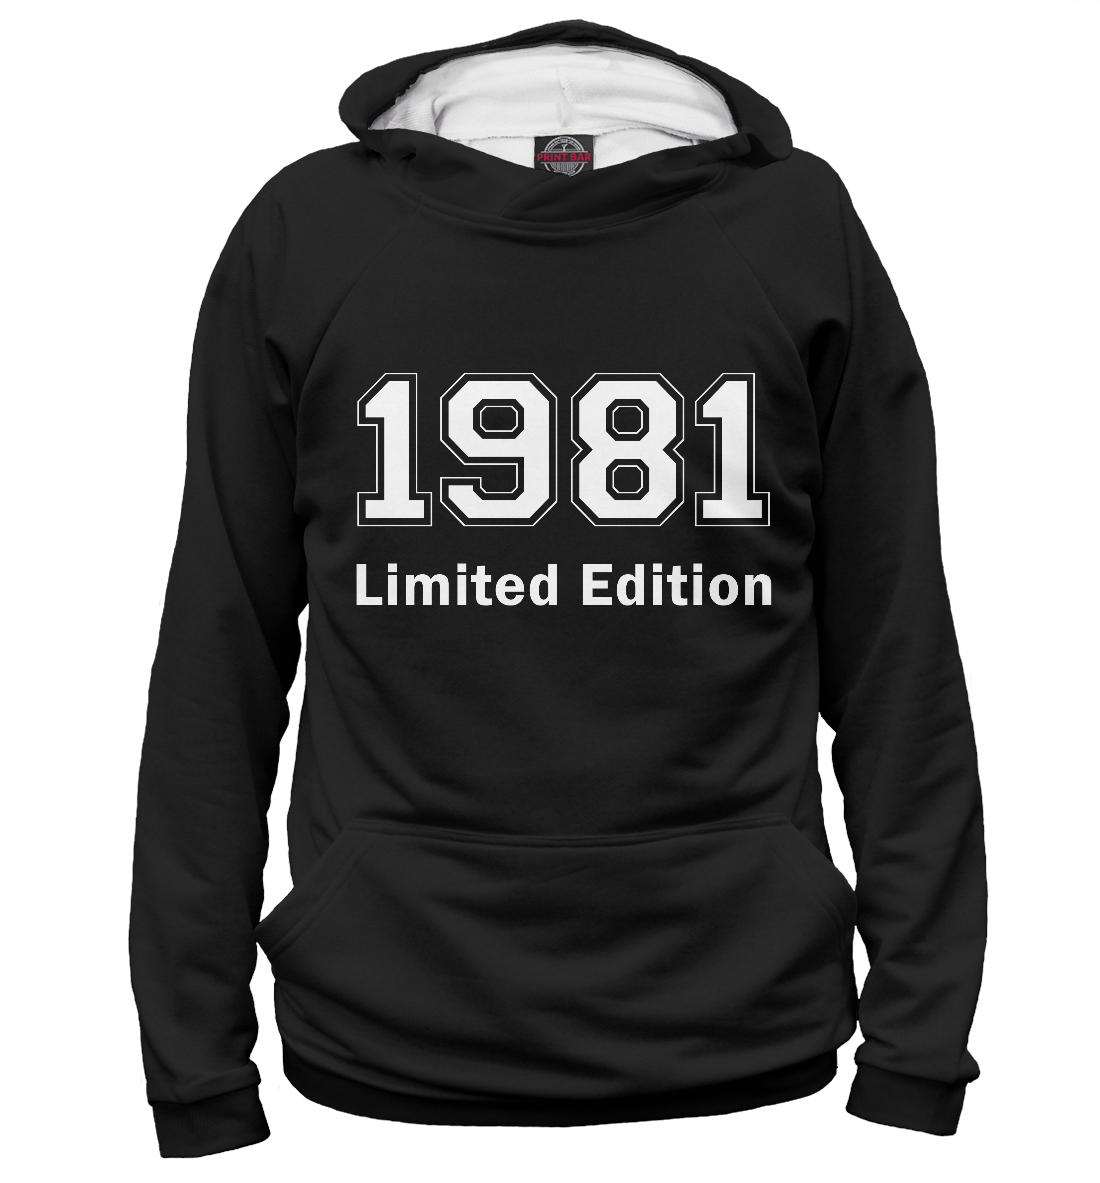 Купить 1981 Limited Edition, Printbar, Худи, DVO-290625-hud-1